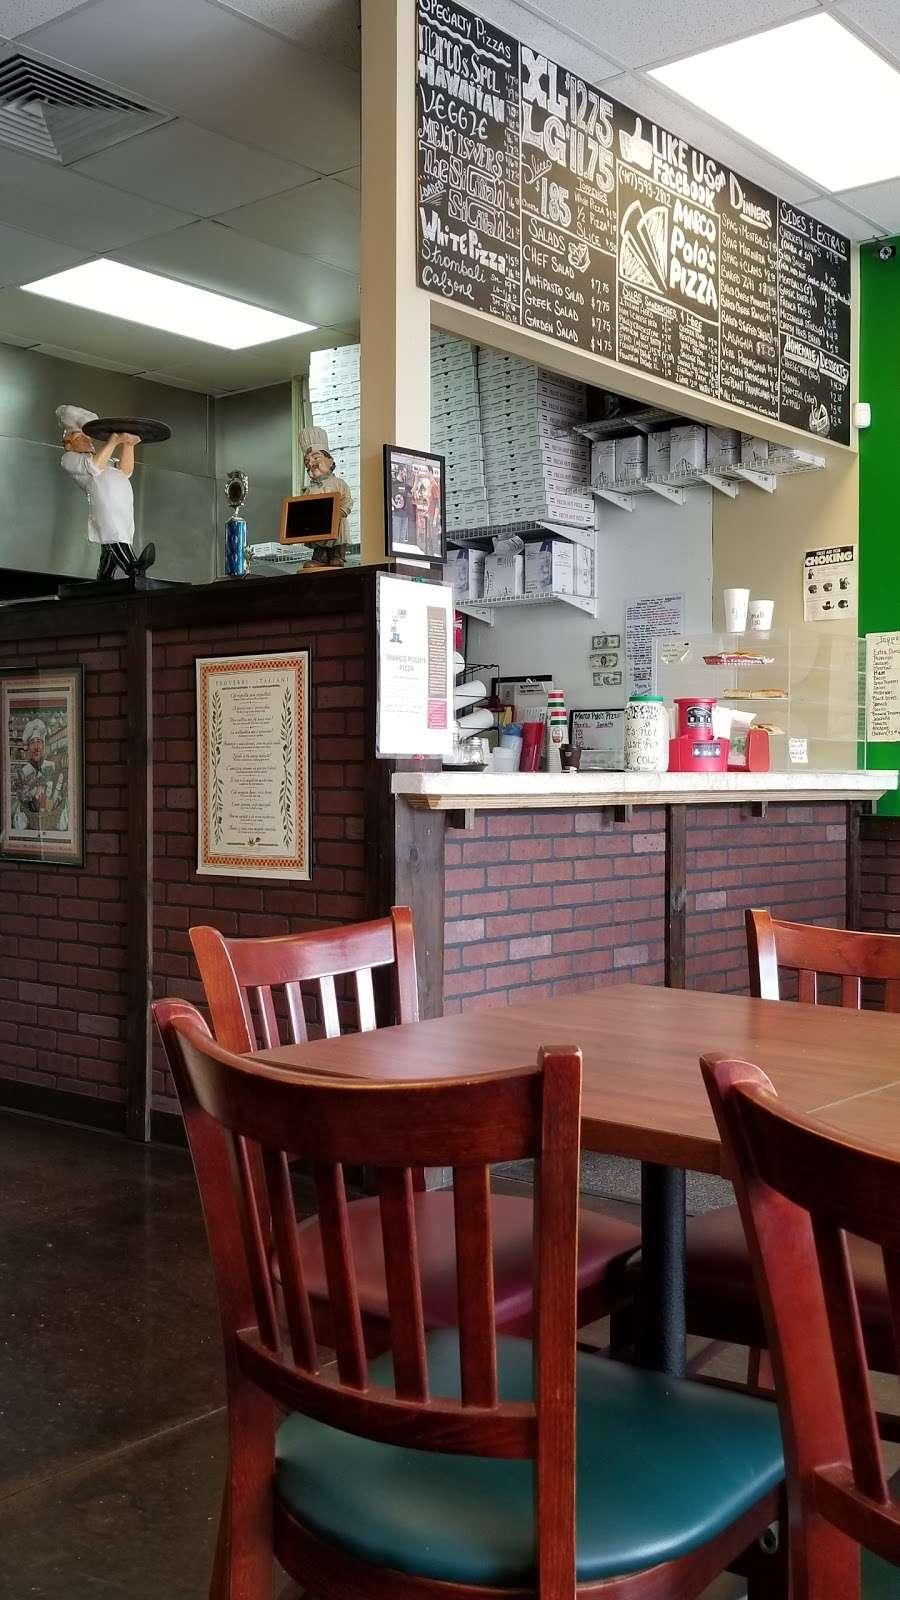 Marco Polos Pizza - restaurant  | Photo 1 of 10 | Address: 3364 Canoe Creek Rd, St Cloud, FL 34772, USA | Phone: (407) 593-2812